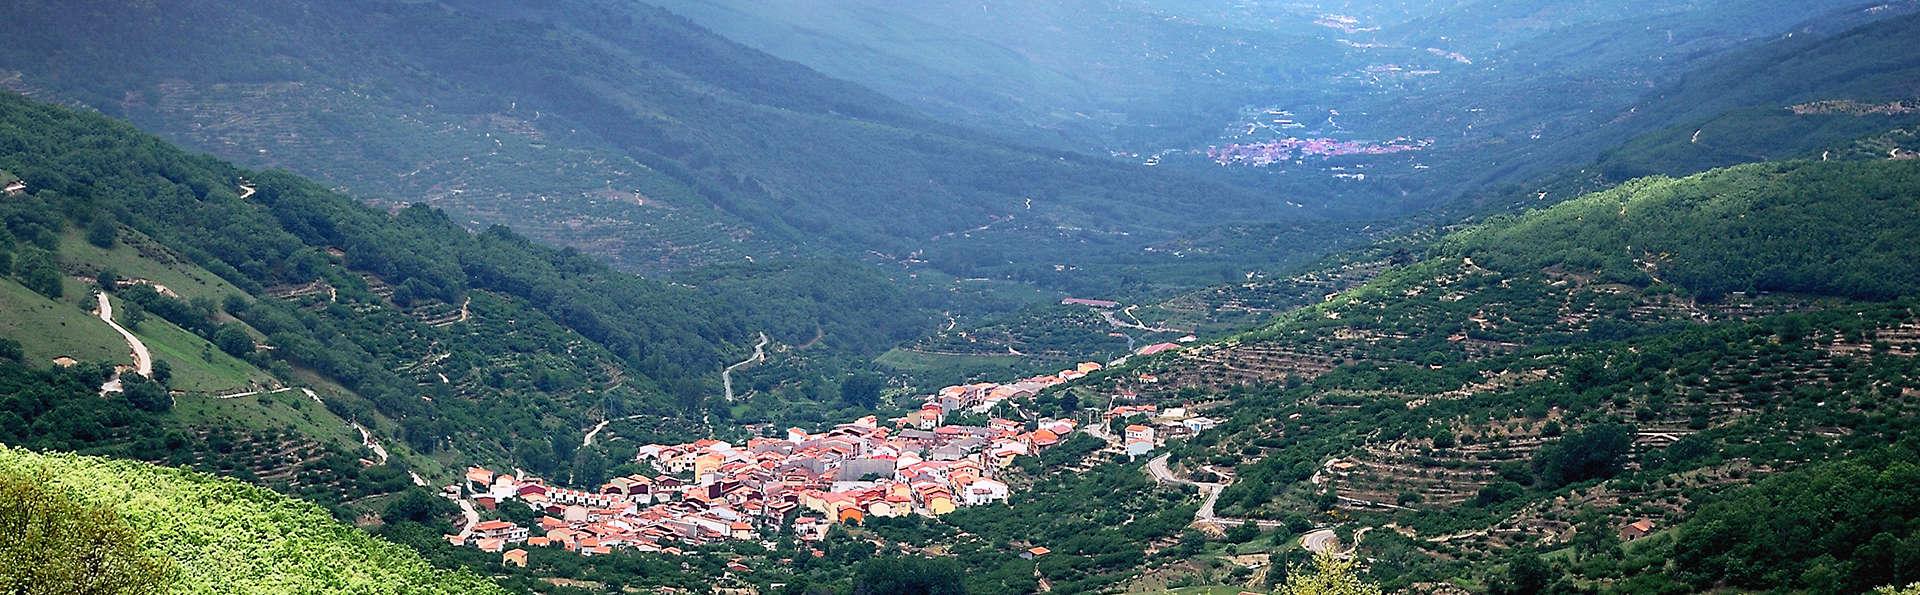 Hotel Valle del Jerte Los Arenales - EDIT_destination.jpg